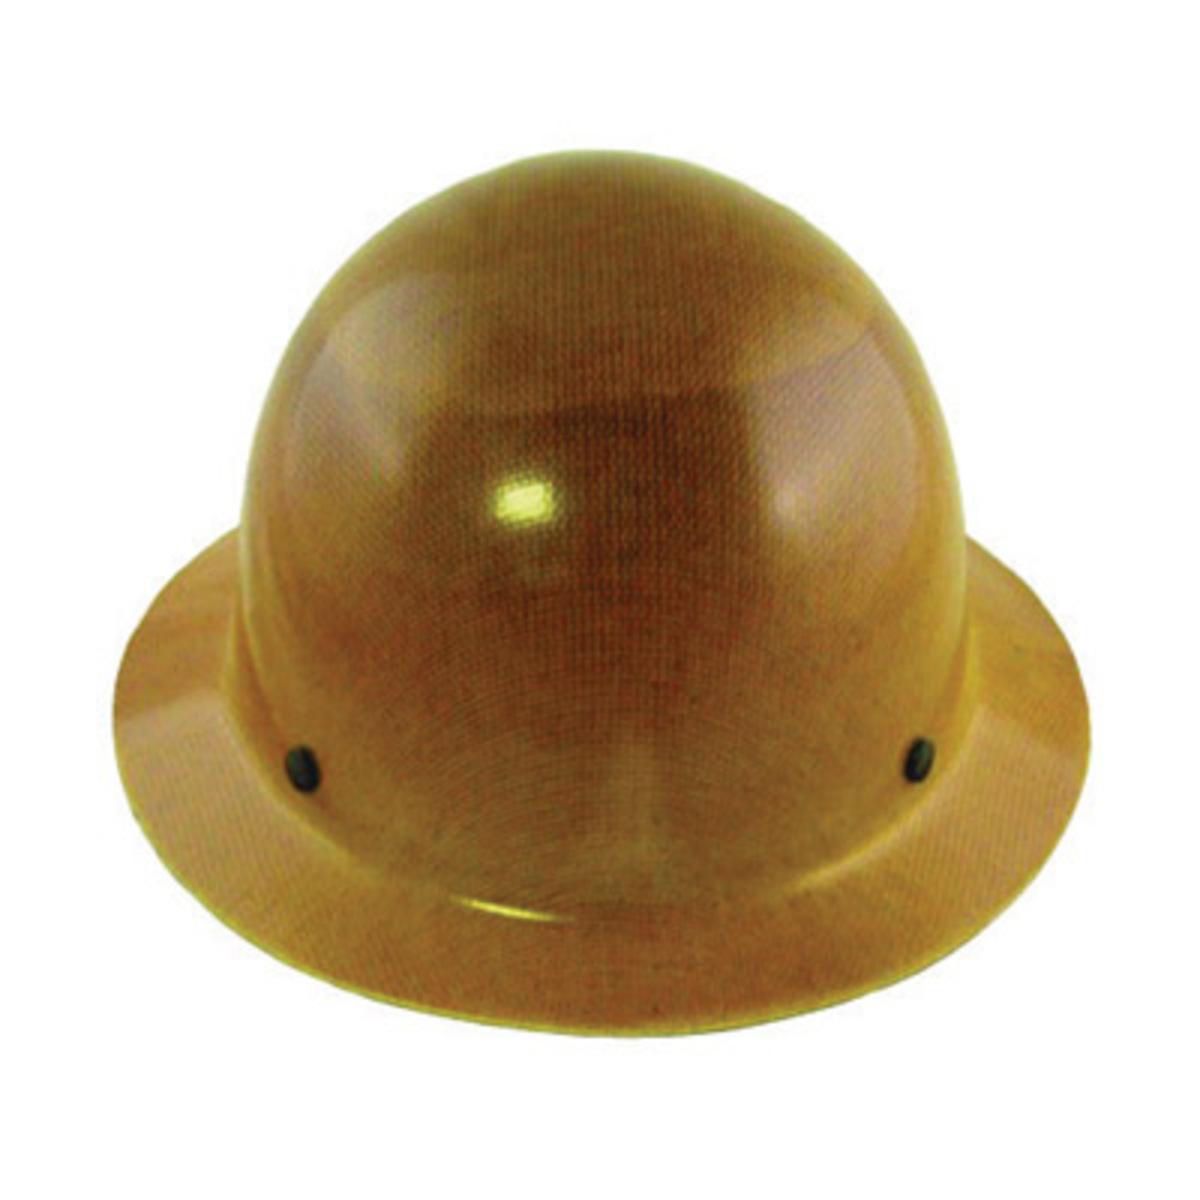 a5c6b8aa967 MSA Tan Phenolic Full Brim Hard Hat With 4 Point Ratchet Suspension